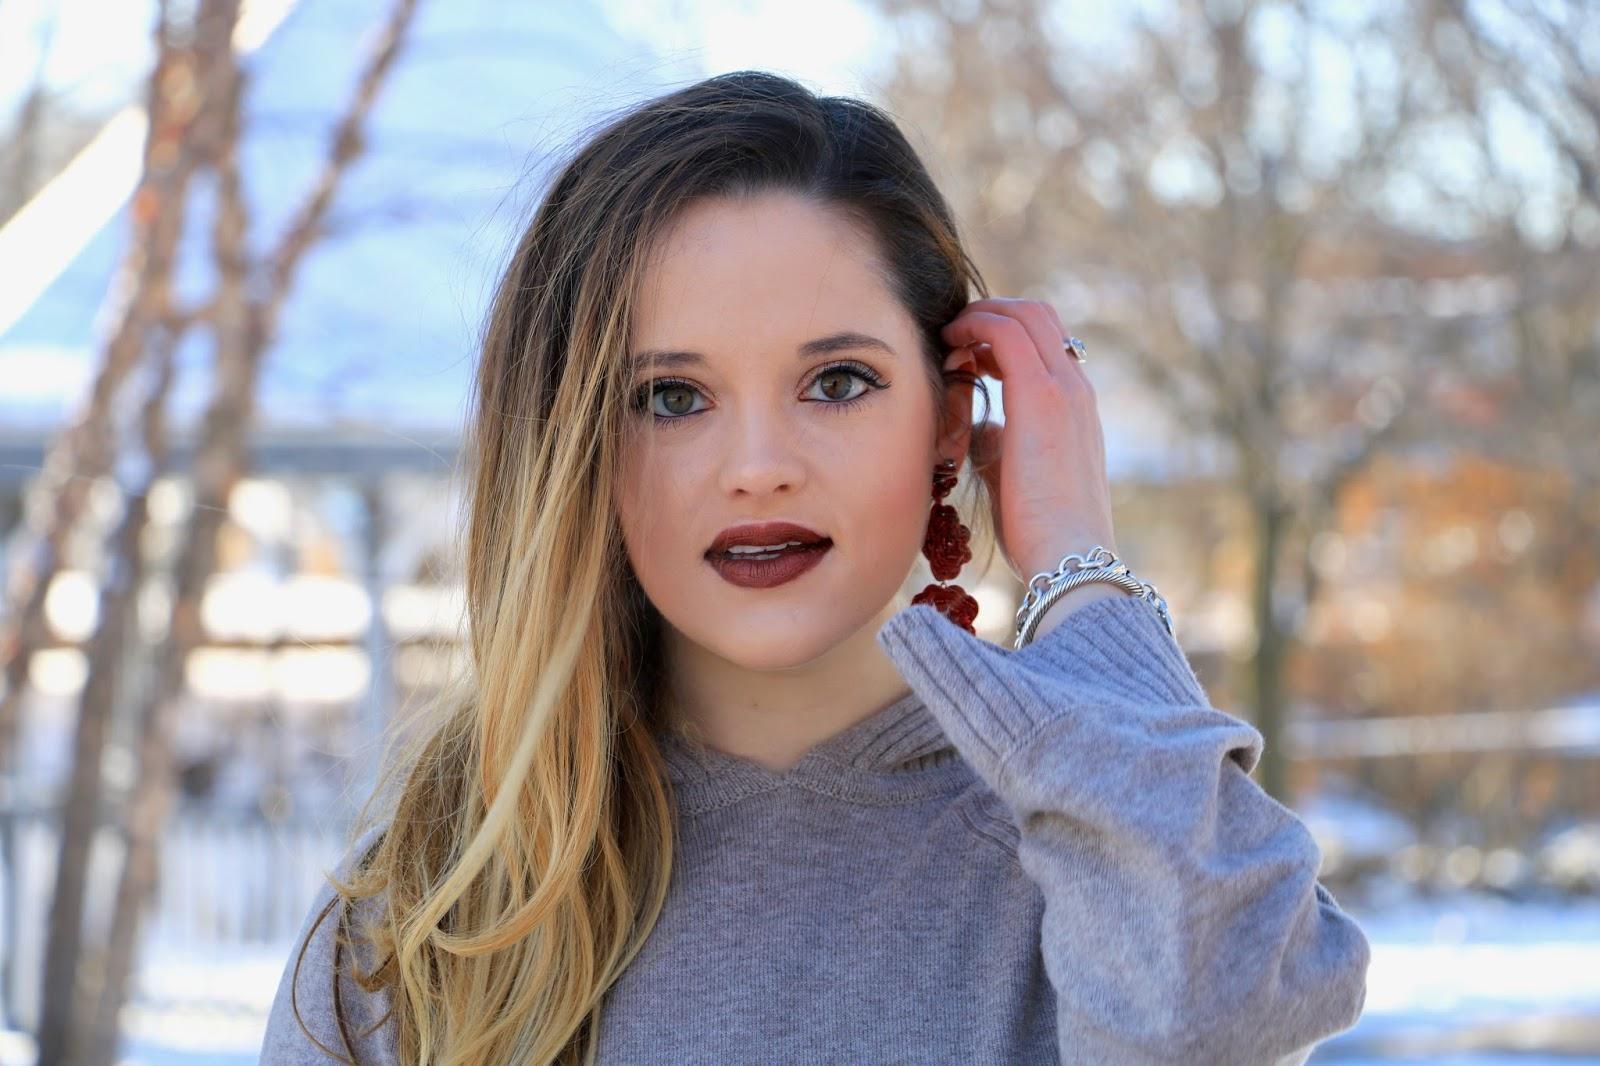 Nyc beauty blogger Kathleen Harper's winter makeup ideas